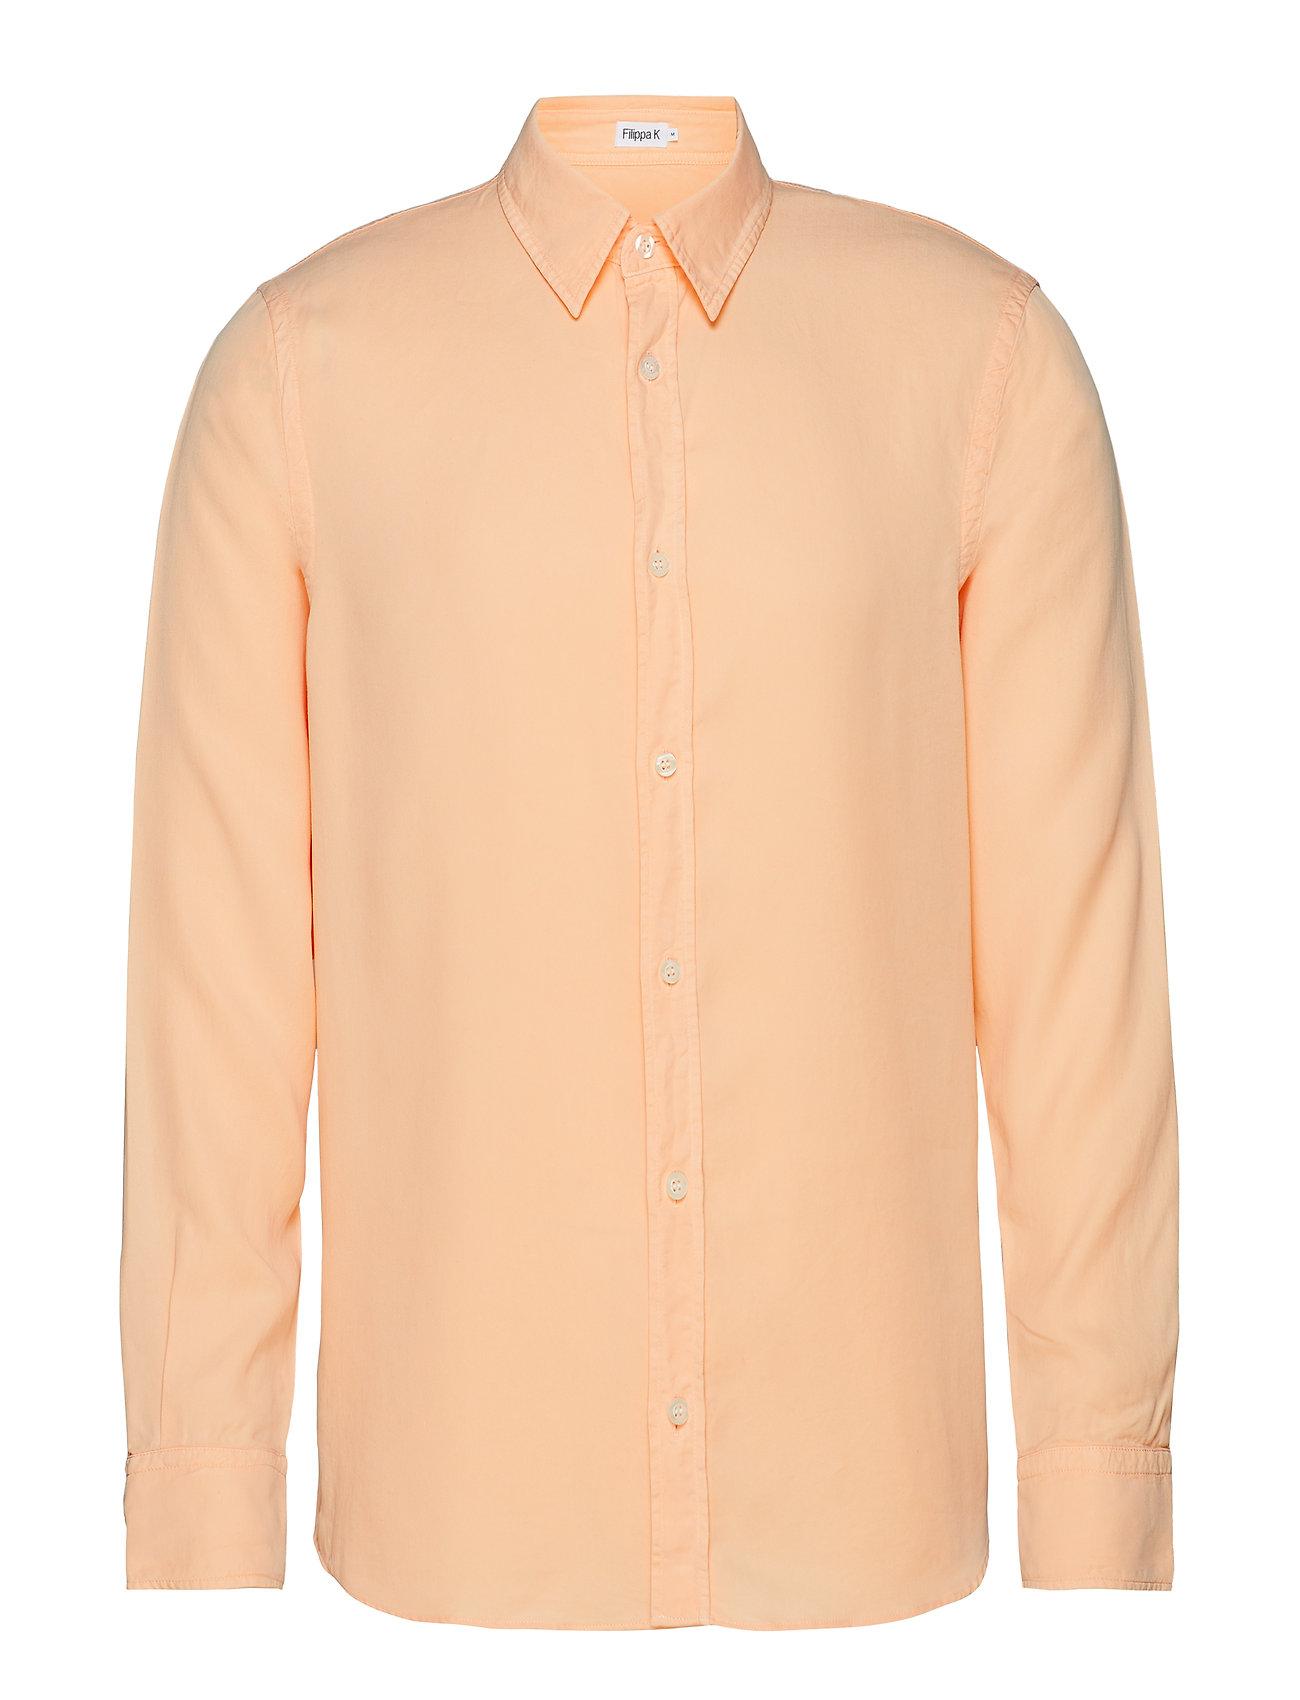 Filippa K M. Ben Tencel Shirt - BELLINI